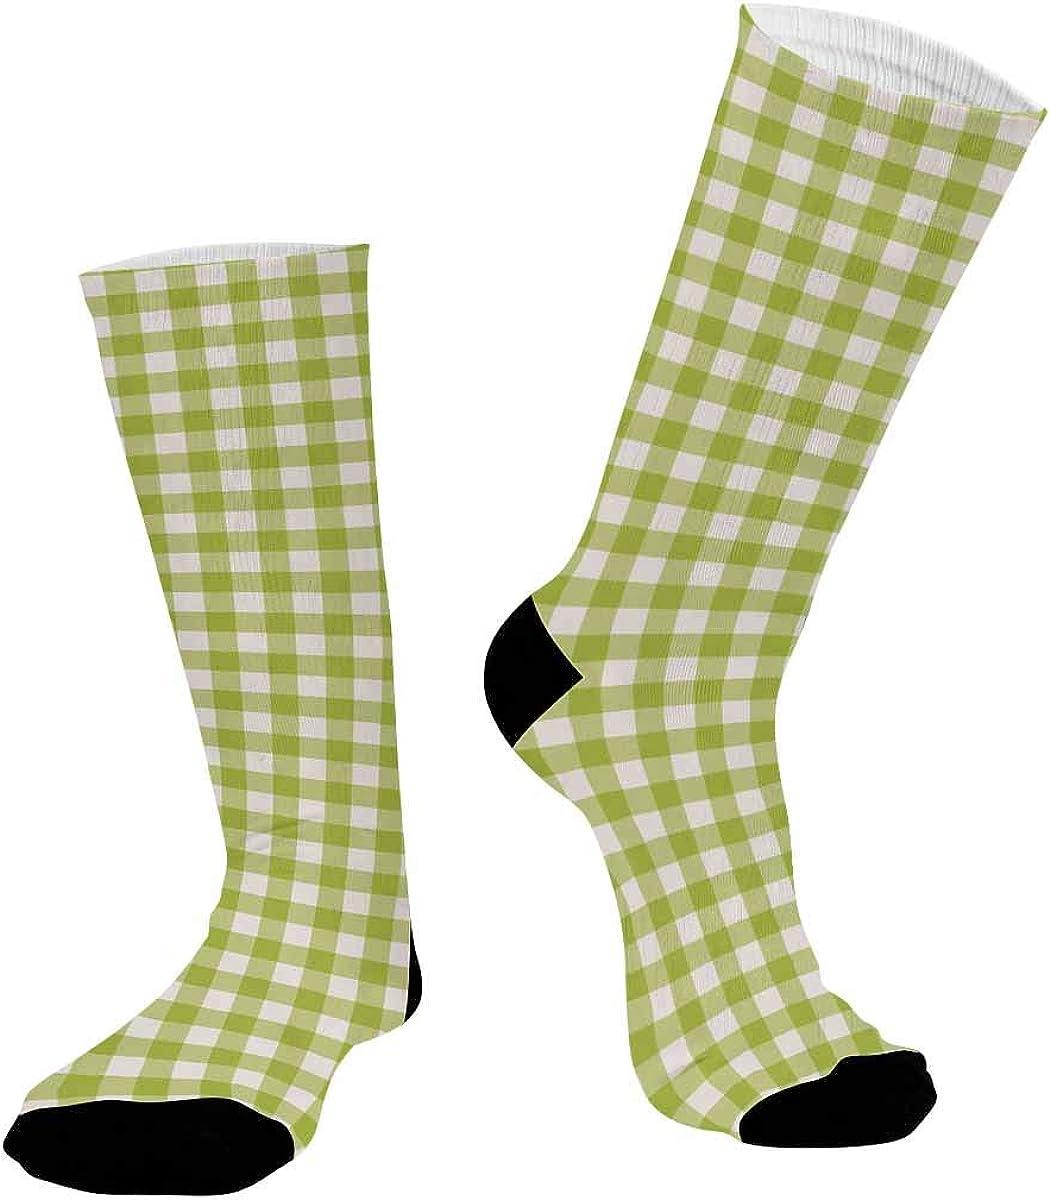 INTERESTPRINT Sublimated Hiking Dress Athletic Crew Socks Green Checkered Pattern